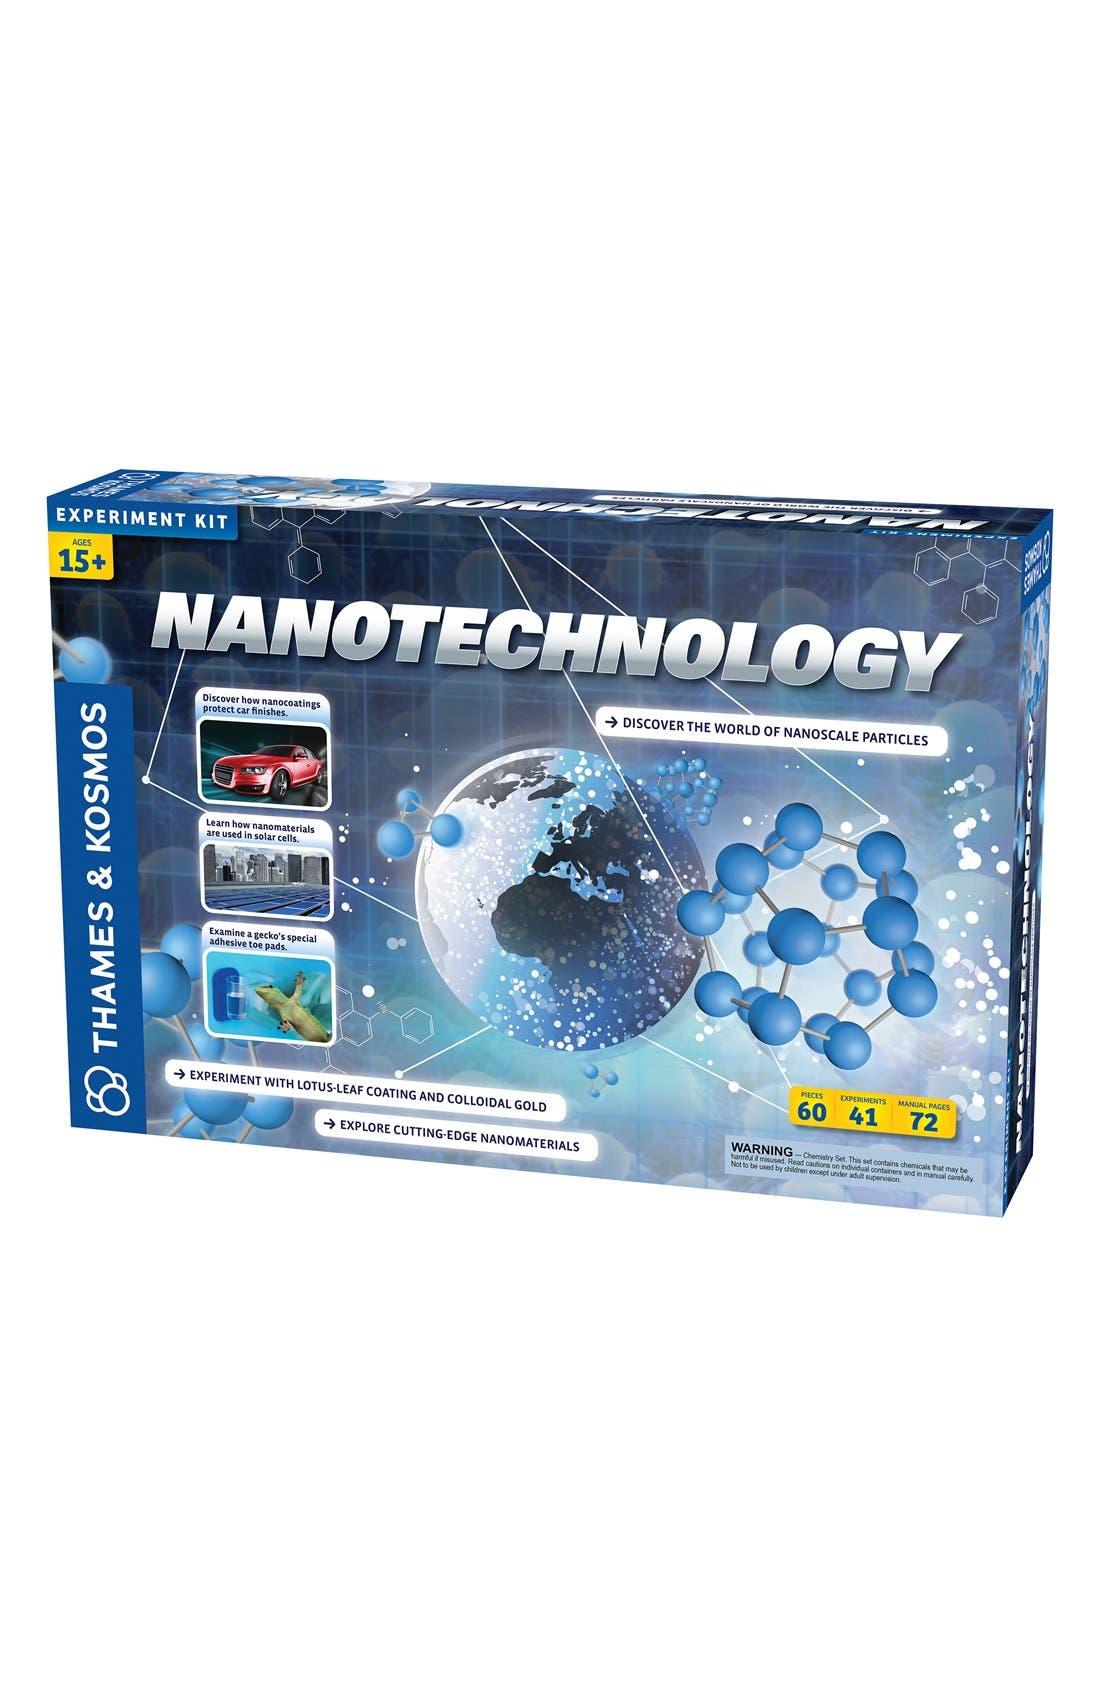 Thames & Kosmos 'Nanotechnology' Experiment Kit